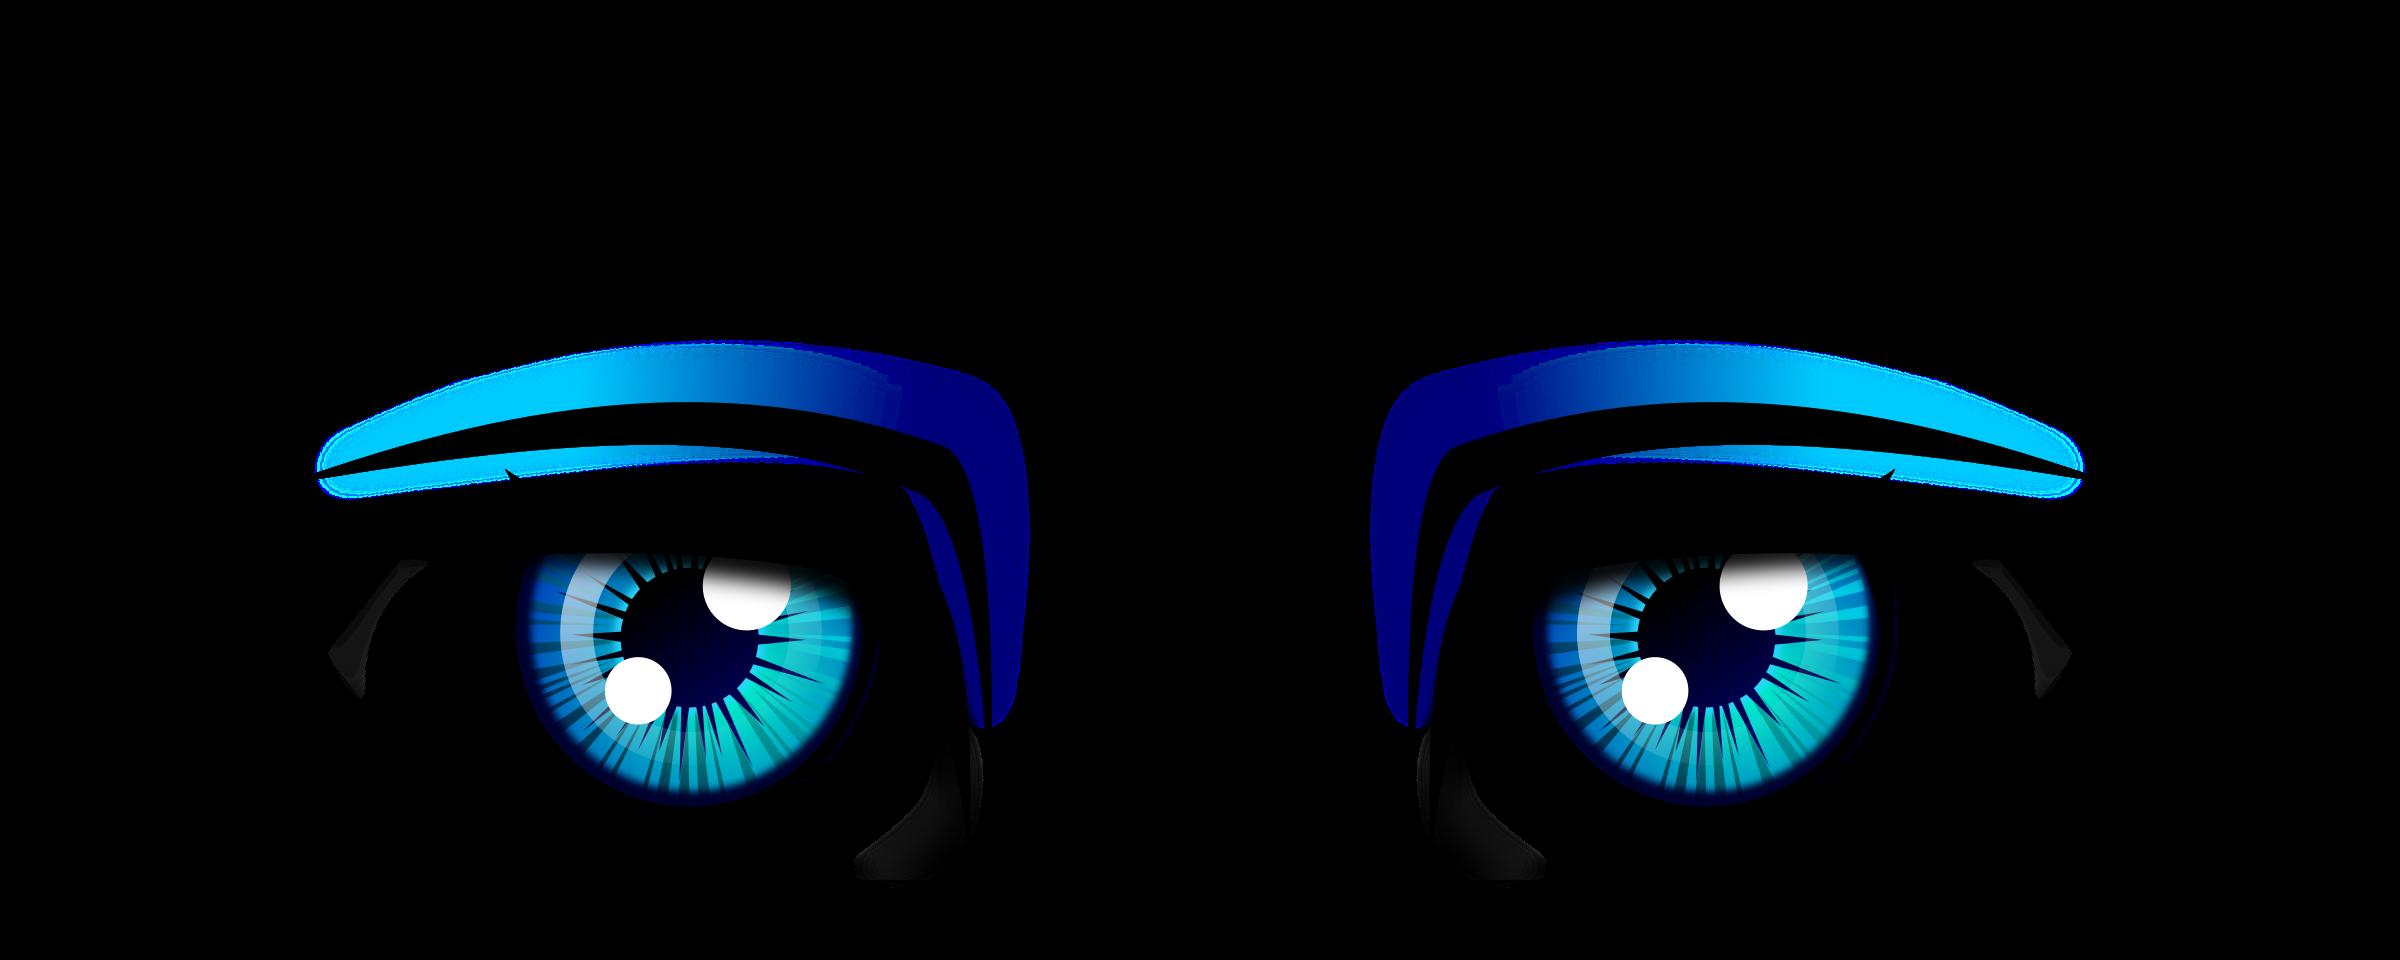 Eyes big image png. Eye clipart boys